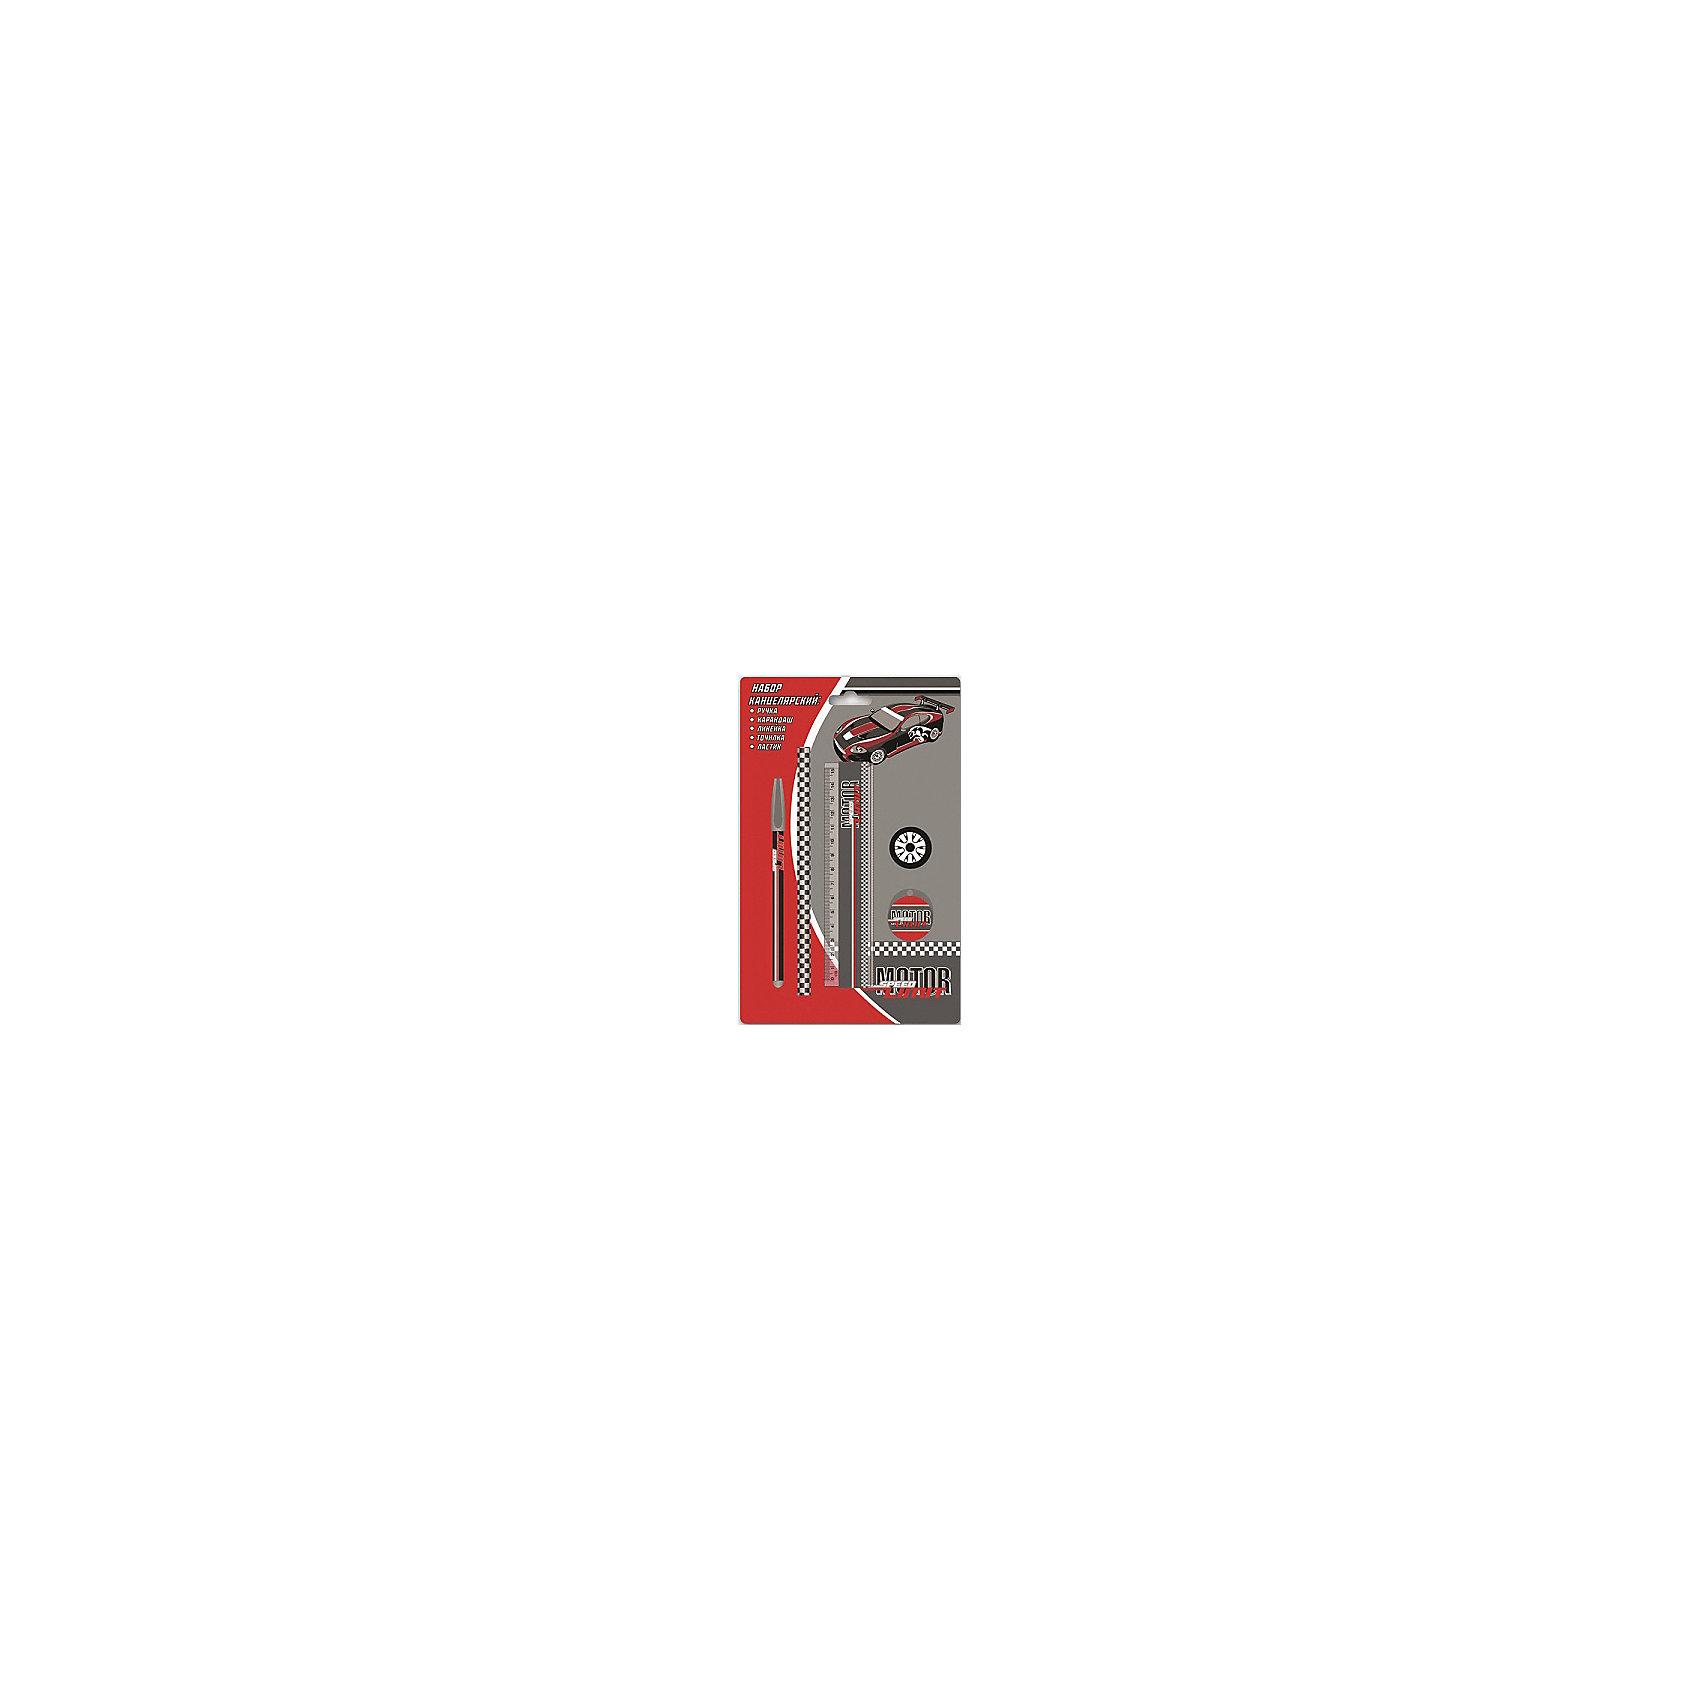 Феникс+ Канцелярский набор Авто, 5 предметов авто люблин в беларуси купить